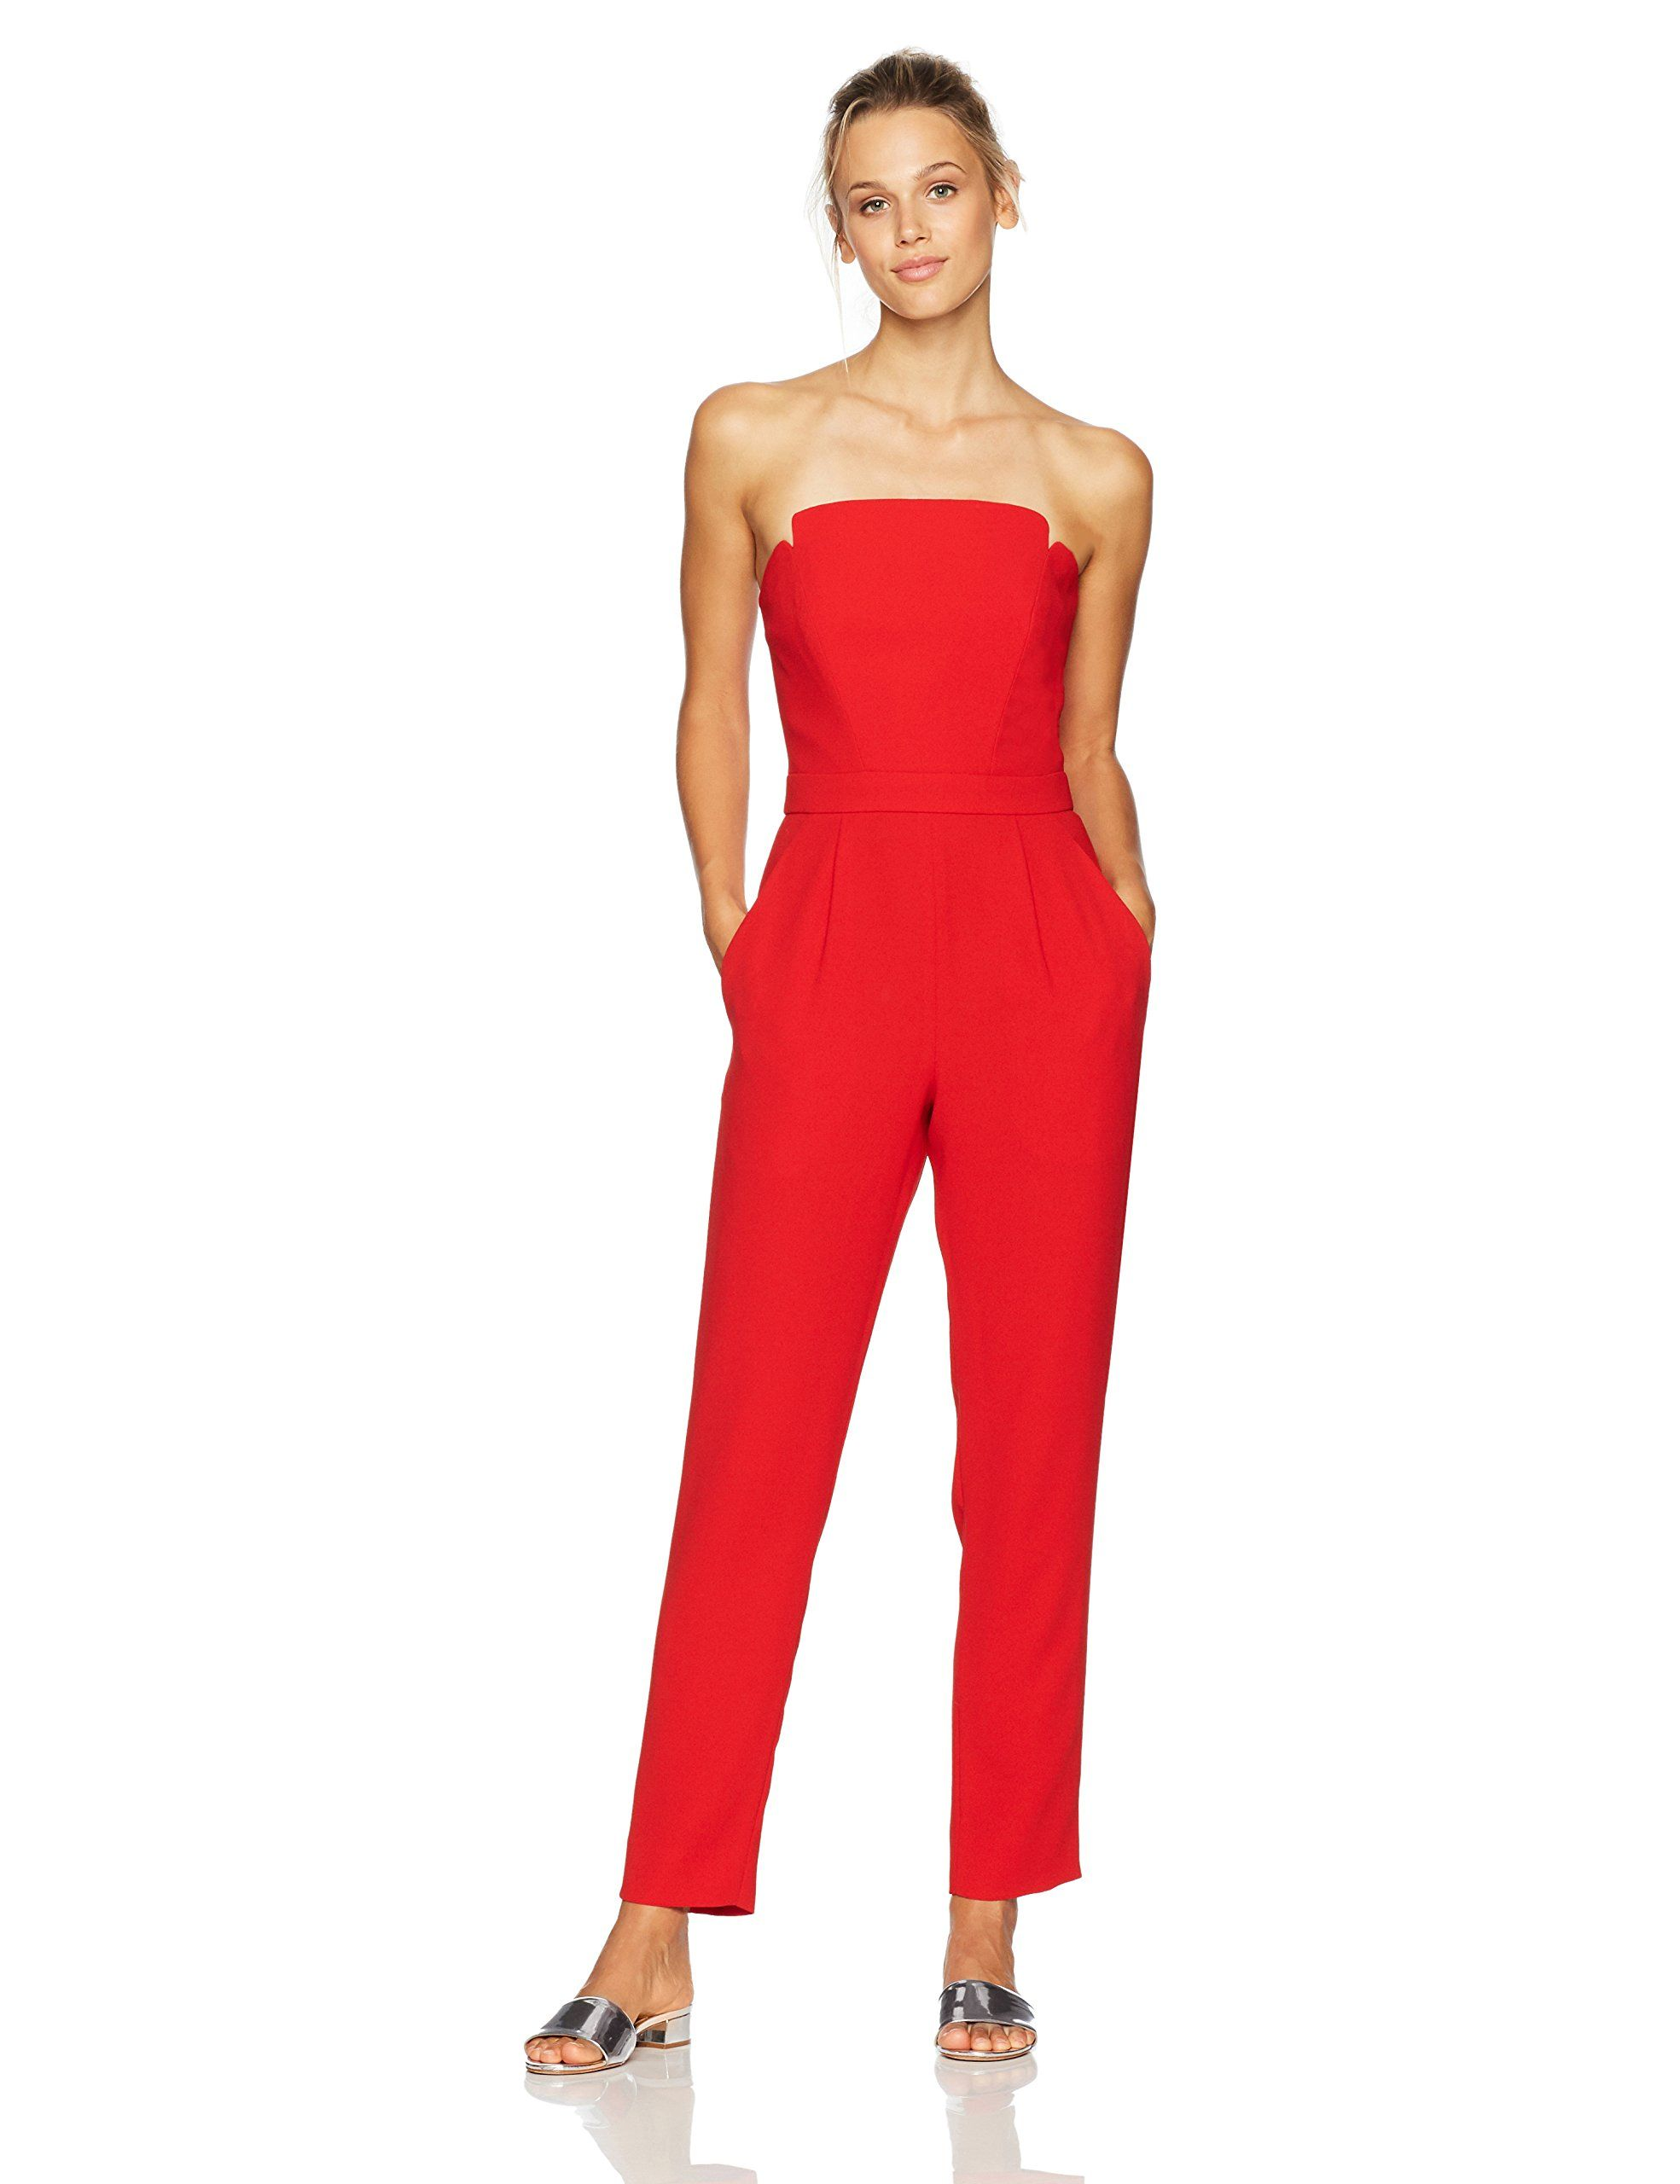 0807f498ae6 Jill Jill Stuart Womens Strapless Jumpsuit Cardinal 6    Want to know more